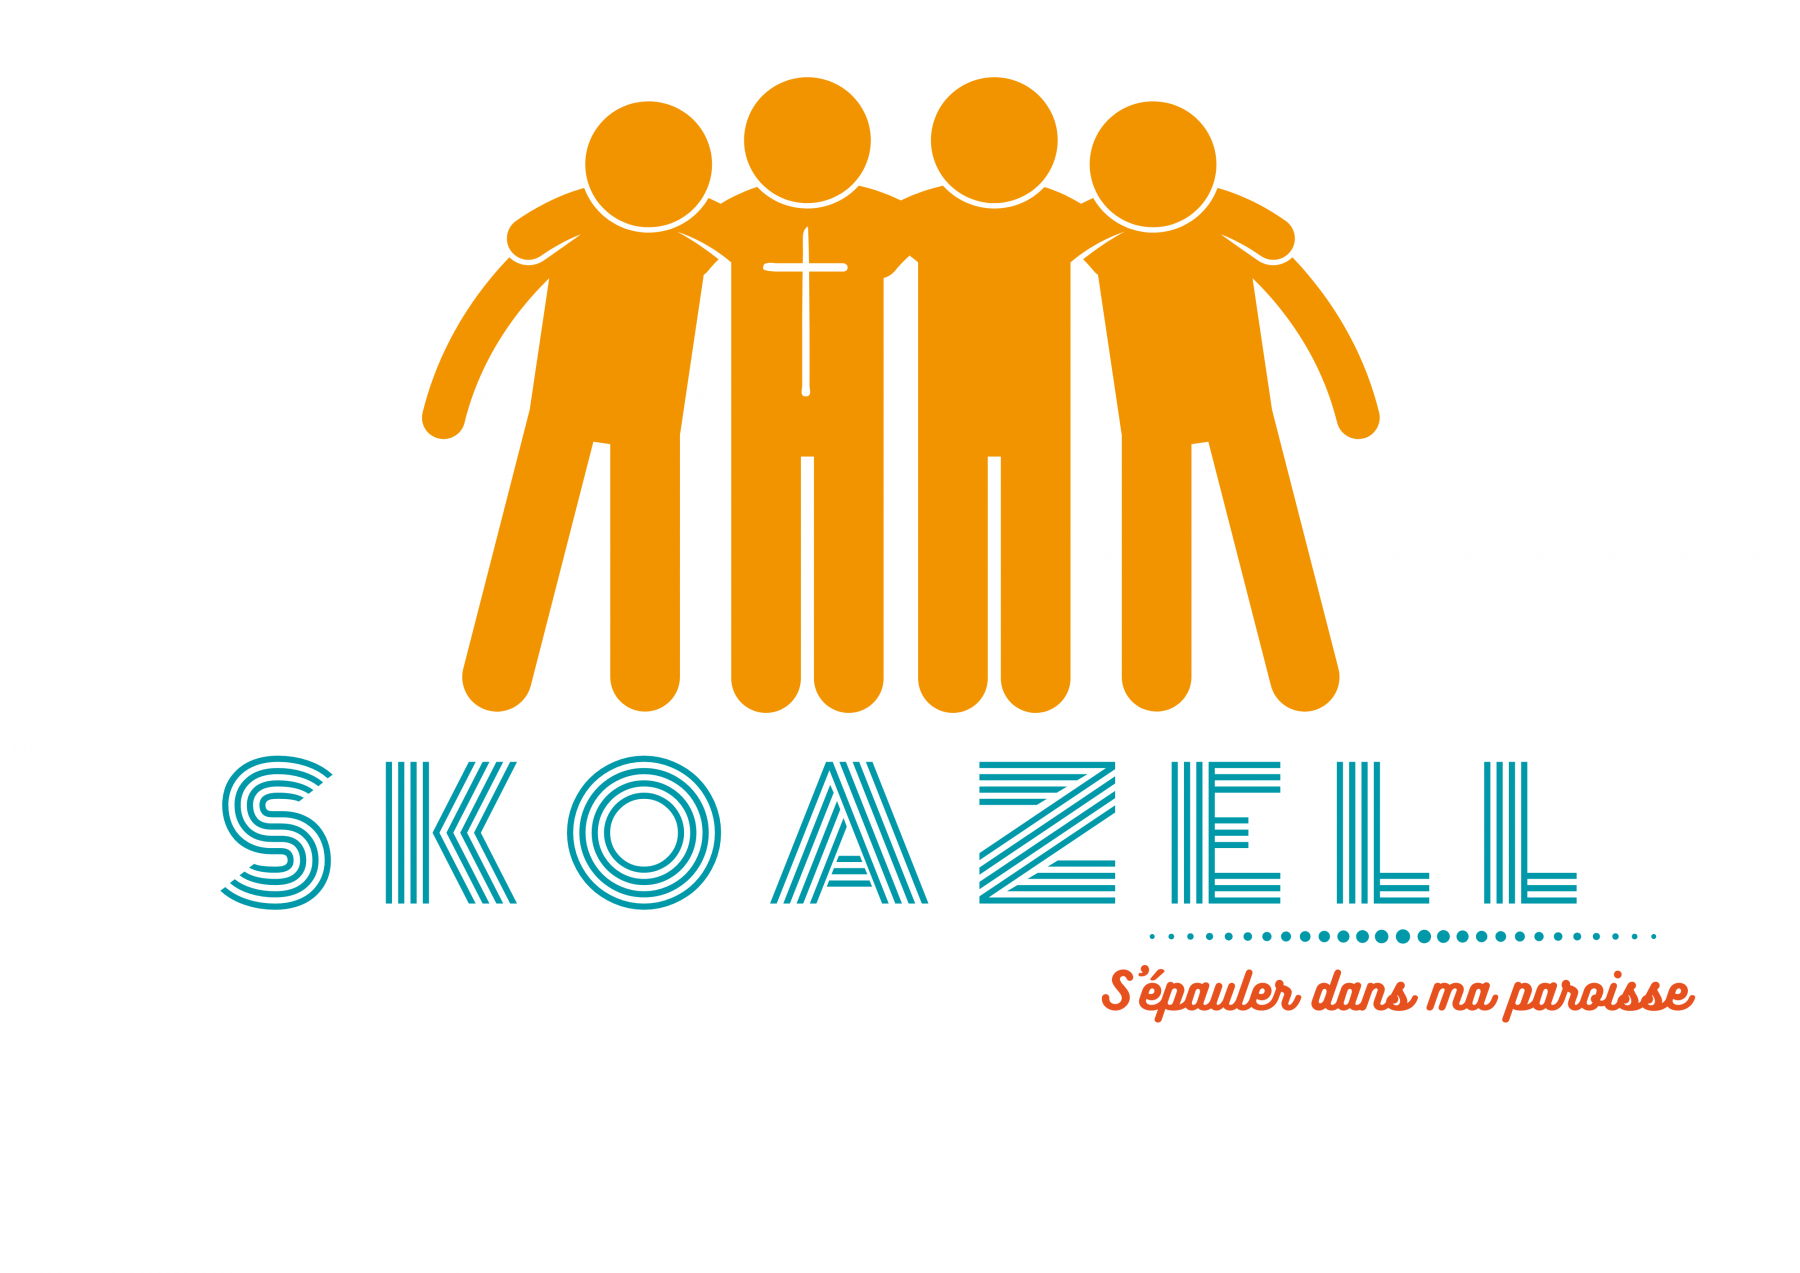 Logo SKOAZELL